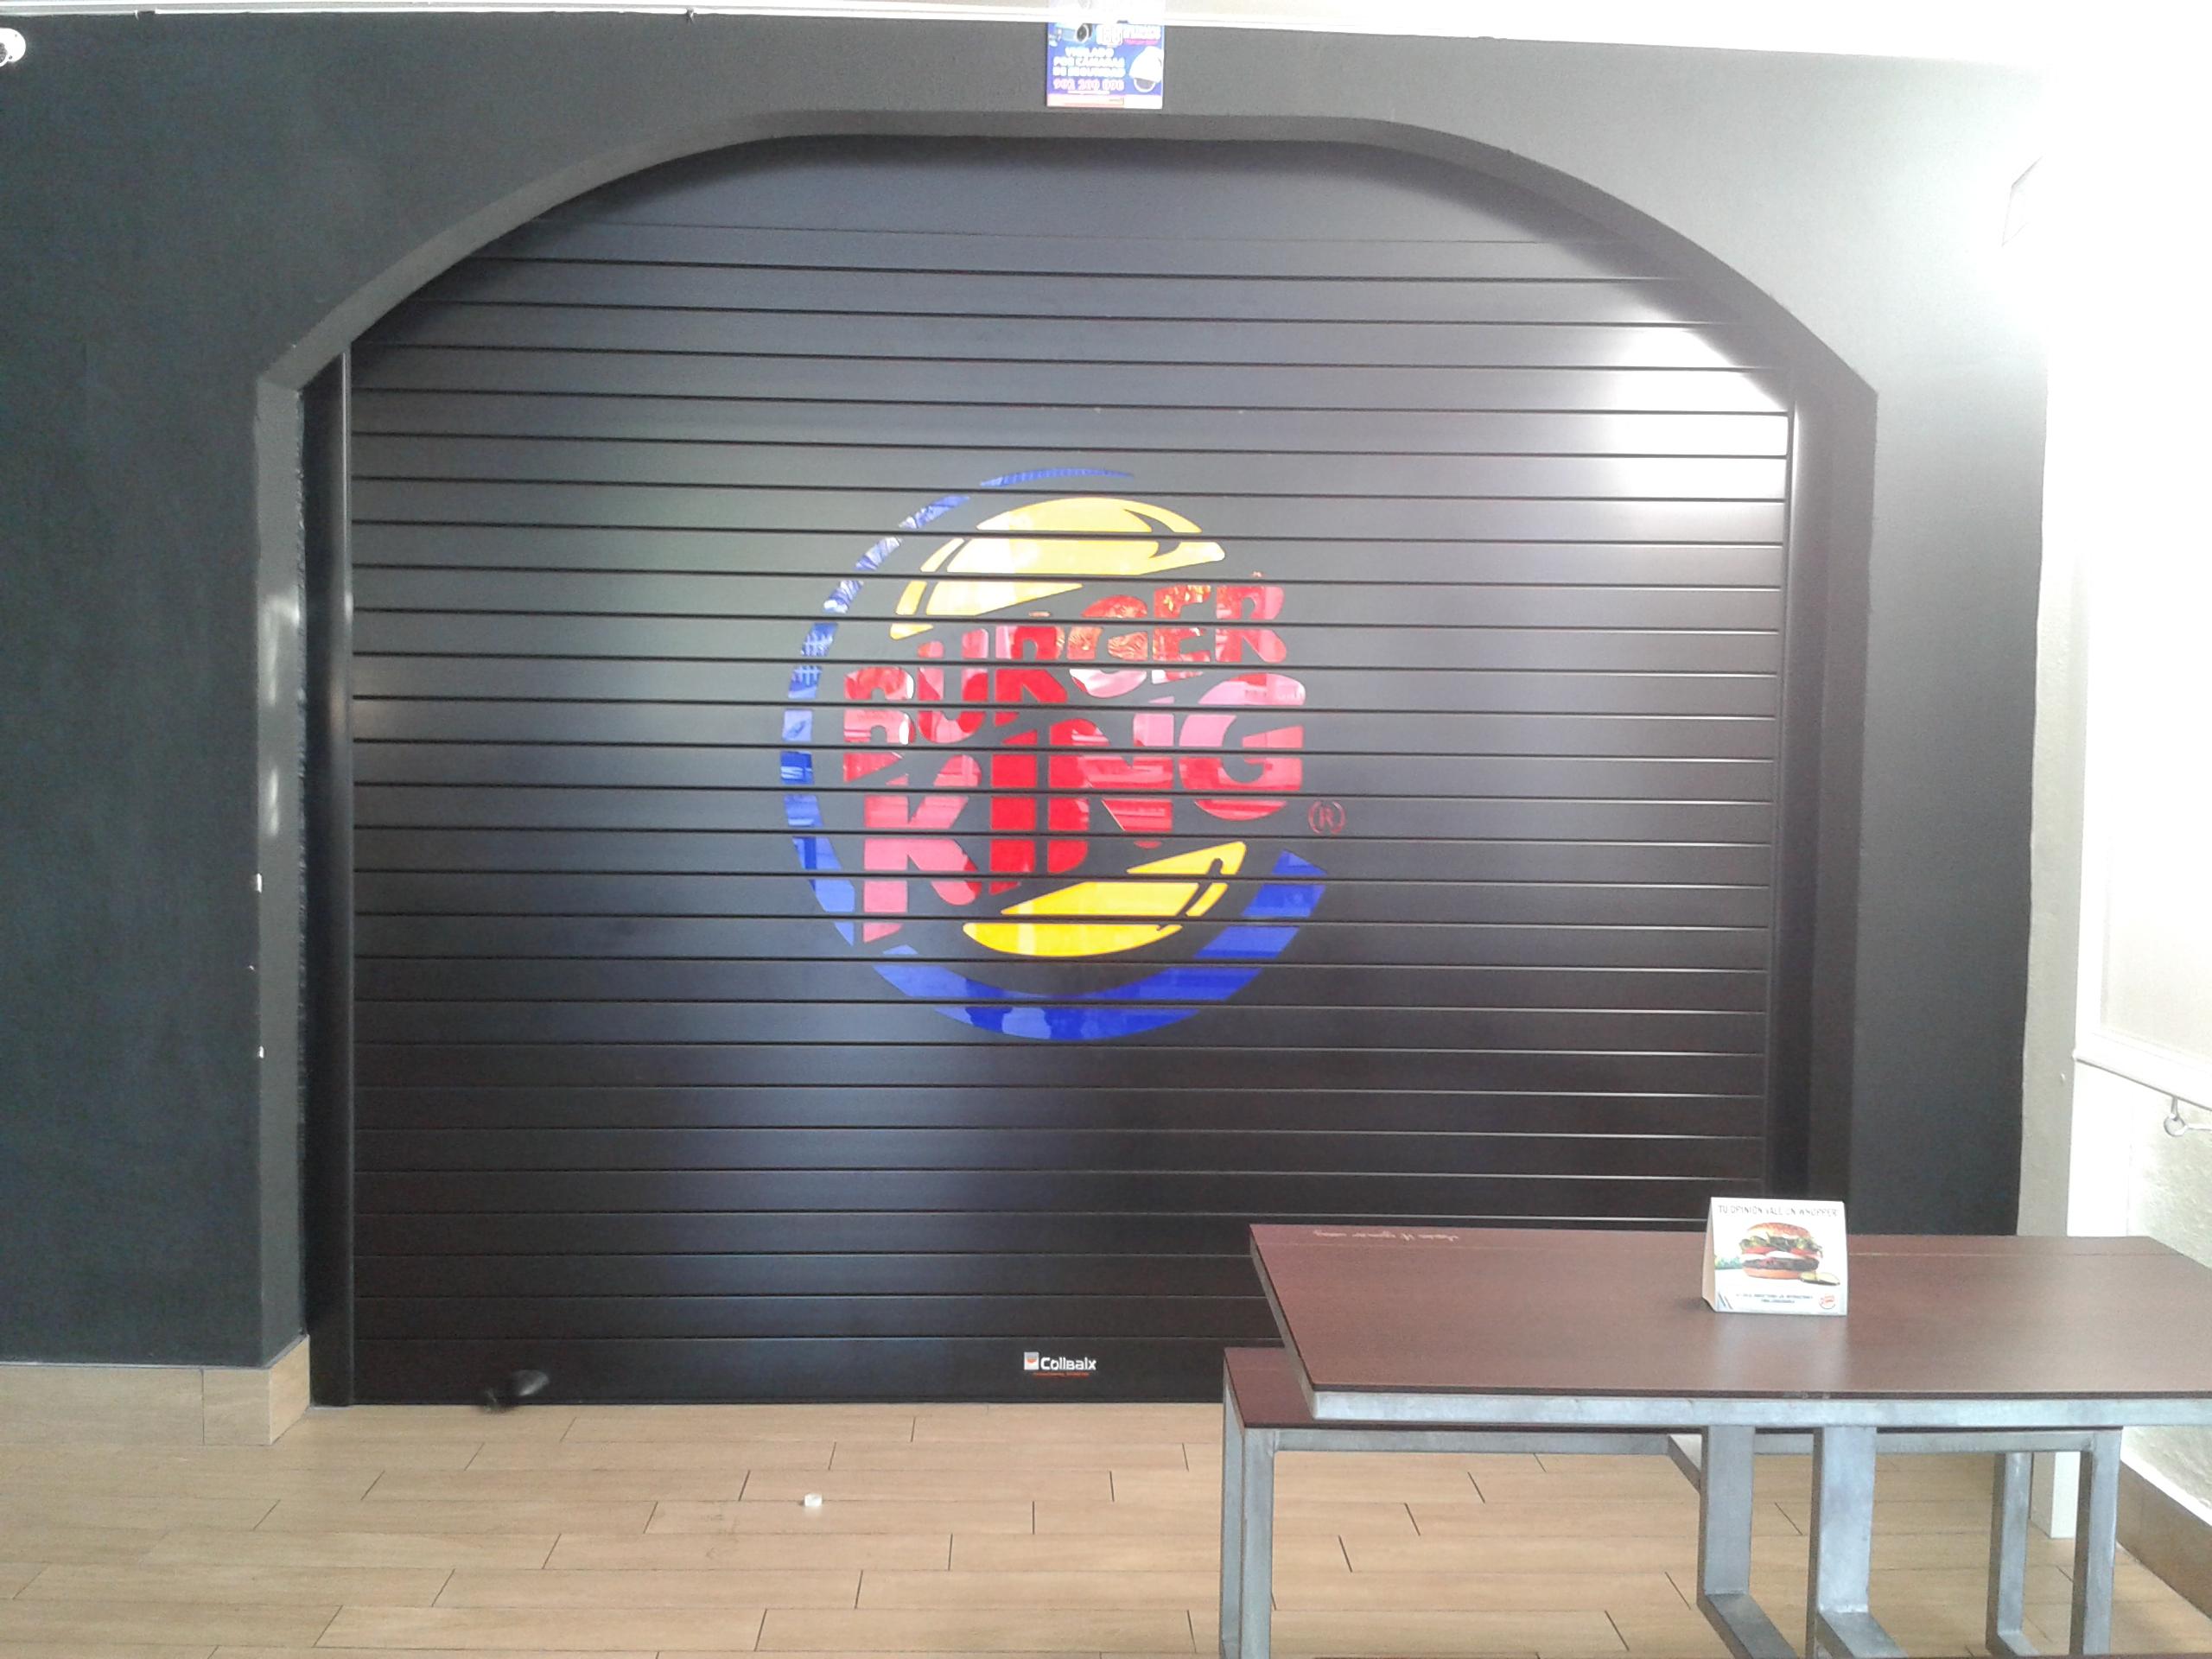 CollBaix Burger King 5.jpg